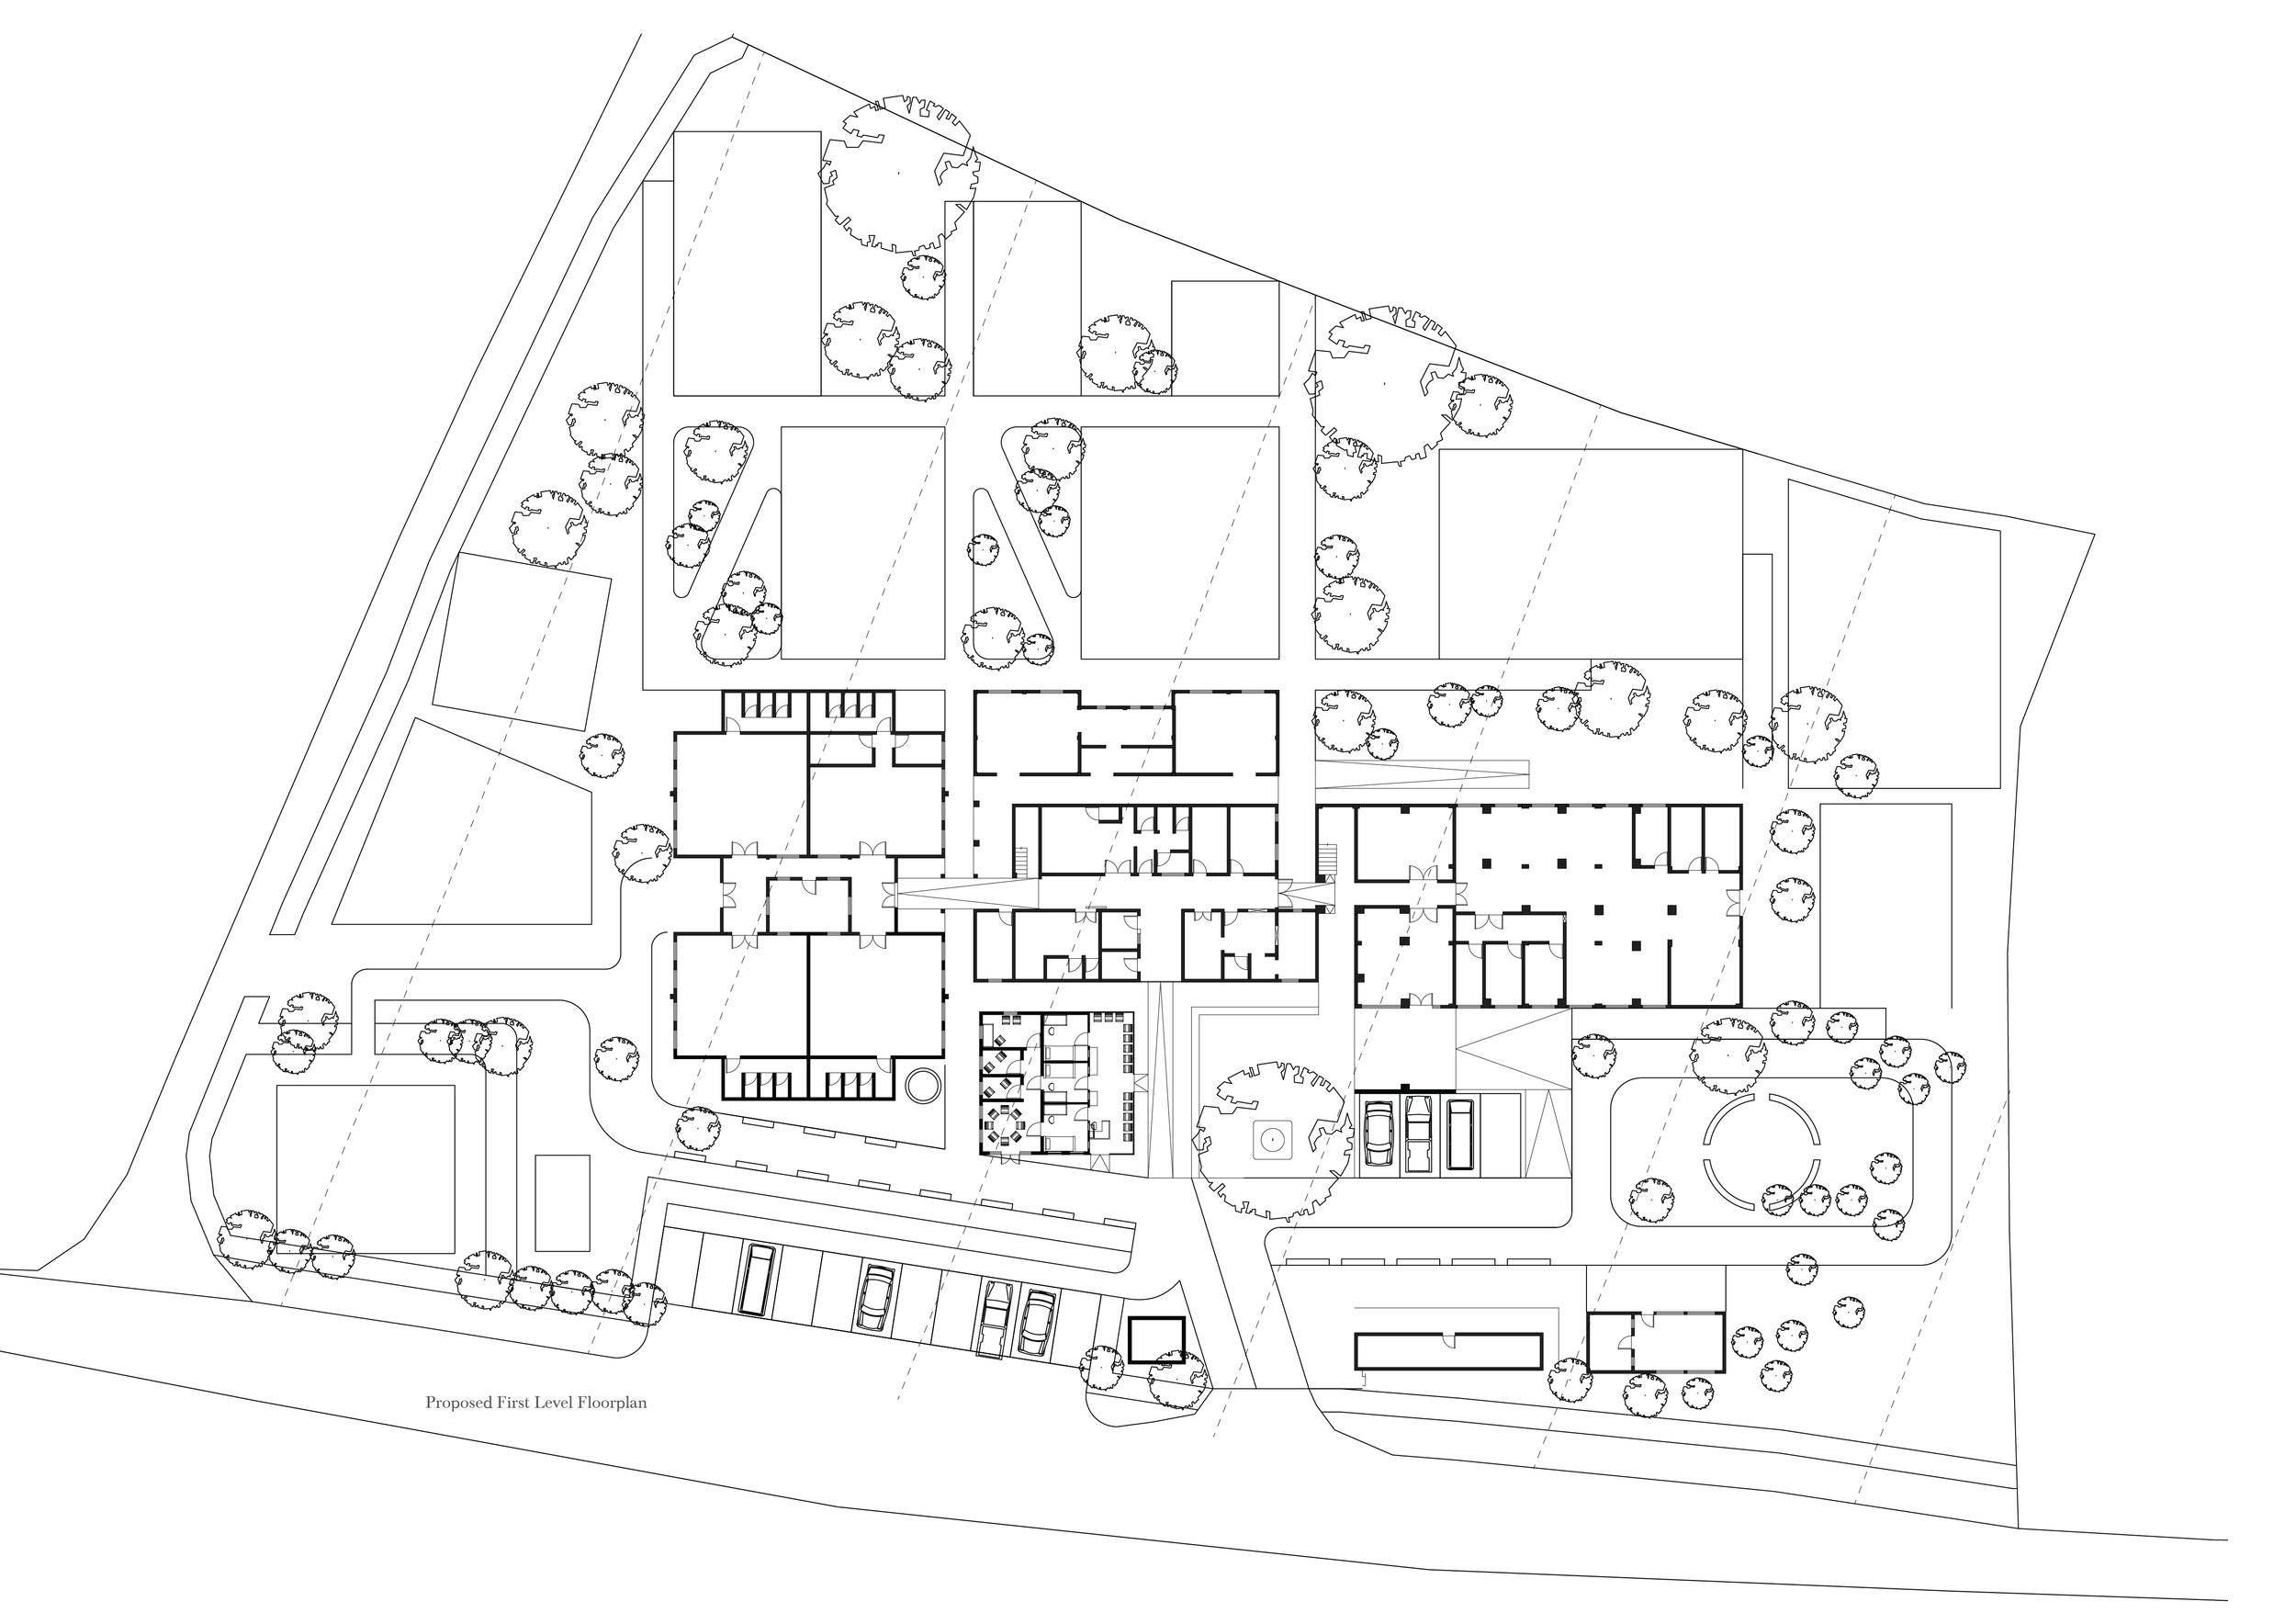 03_SagamHospital_Masterplan-05.jpg